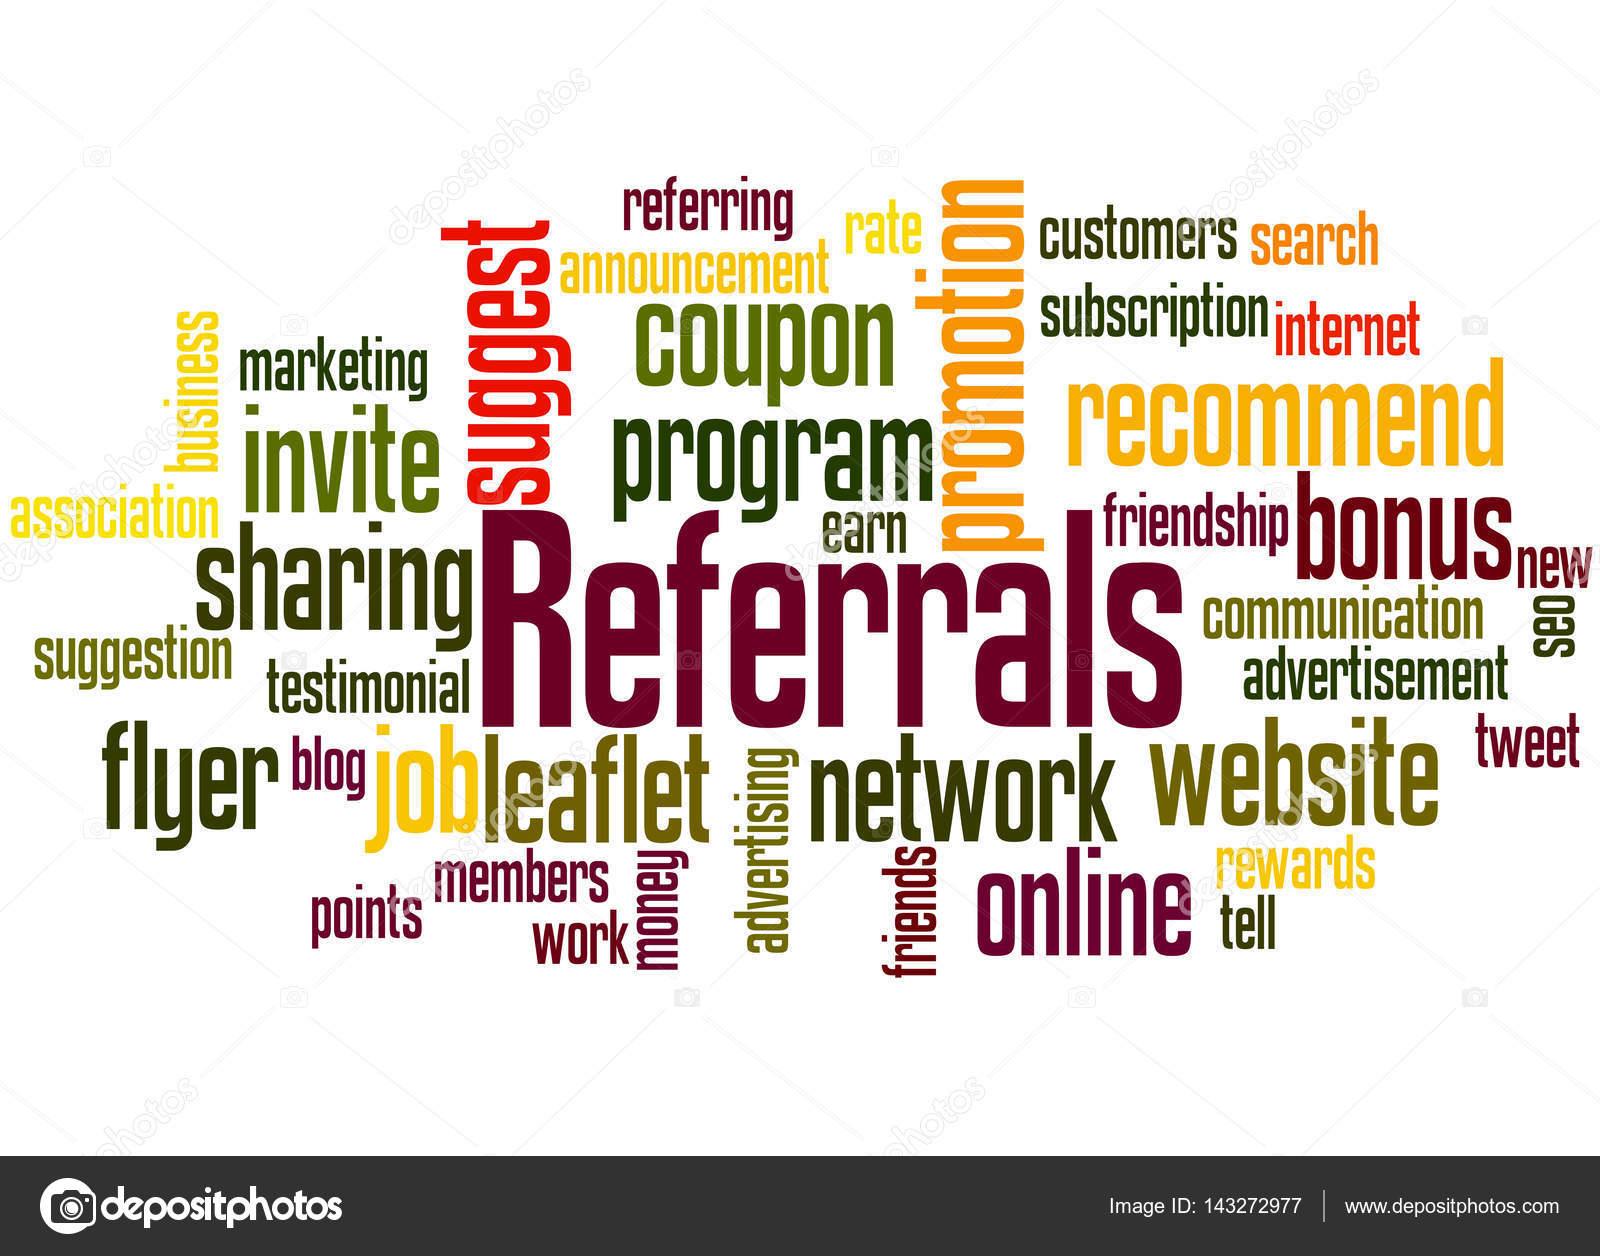 Referrals, word cloud concept 5 — Stock Photo © kataklinger